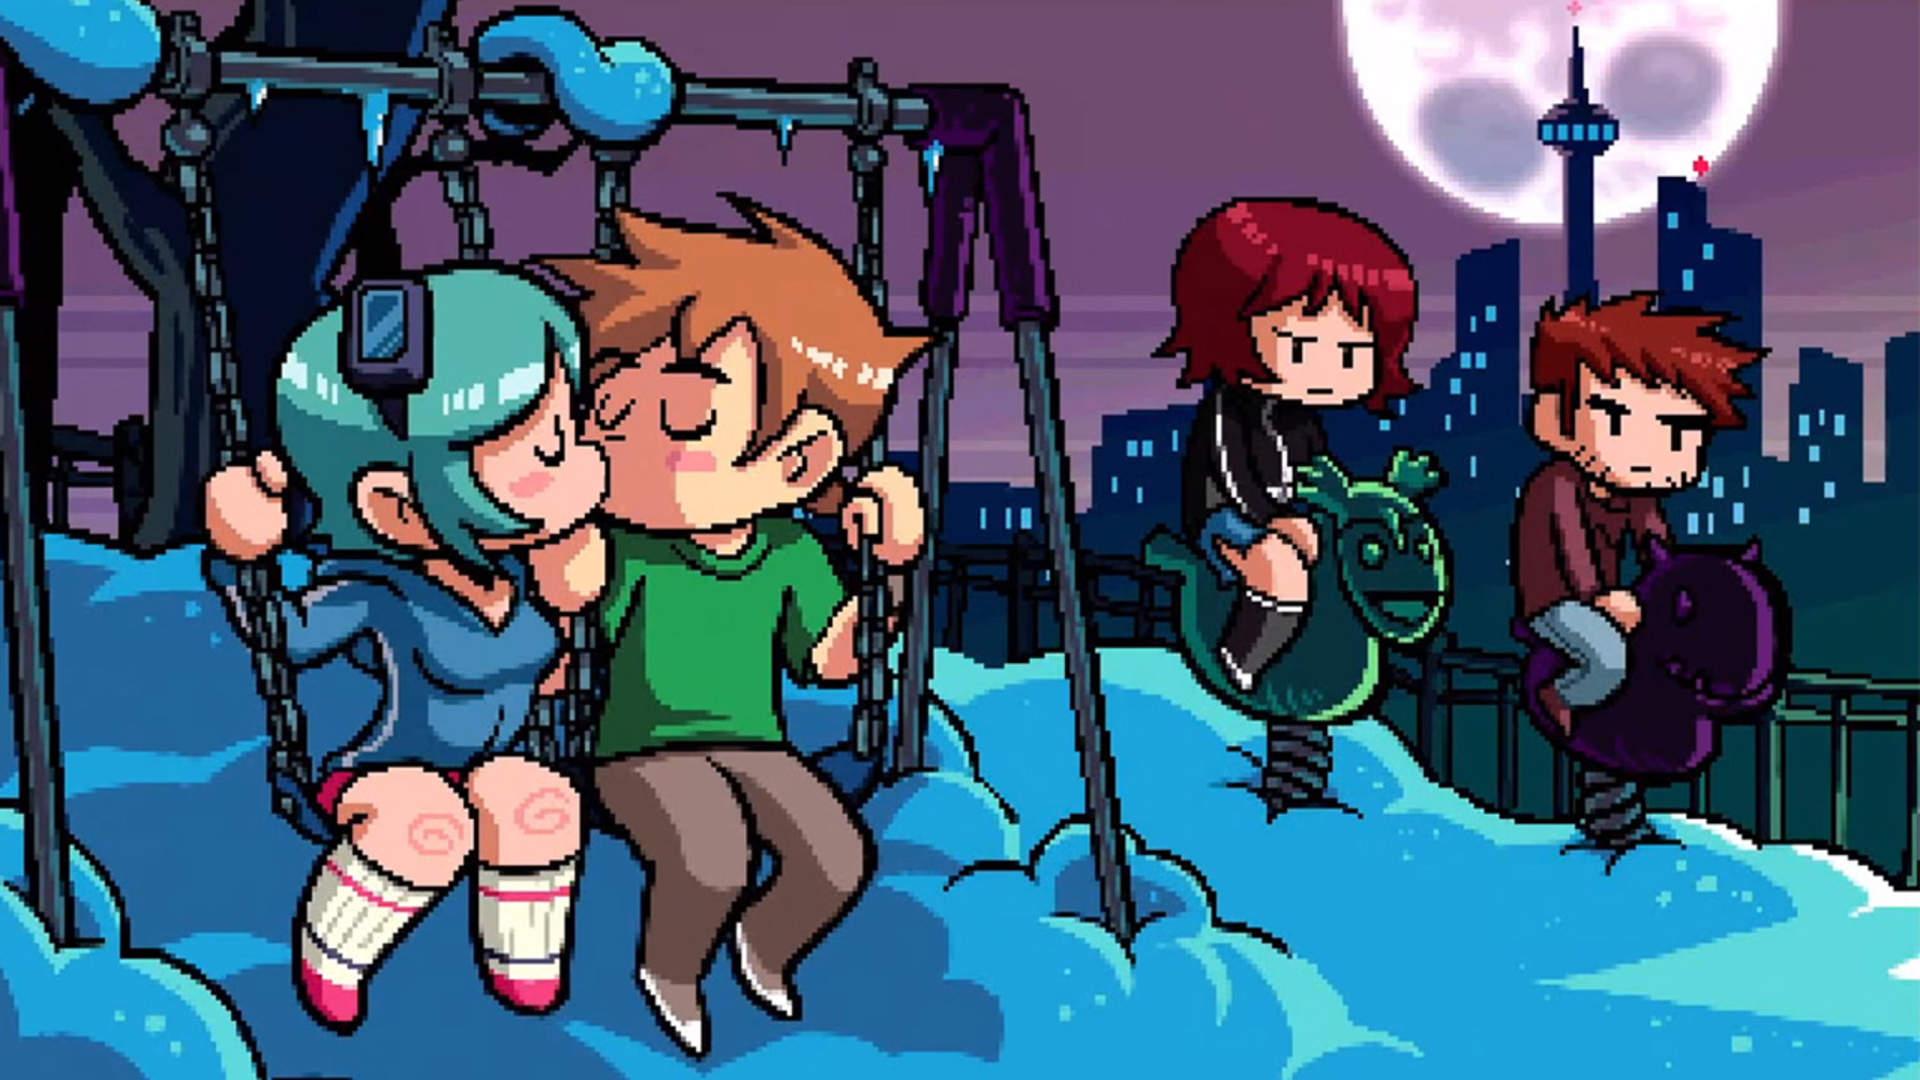 Scott and Ramona share a kiss on the swingset.